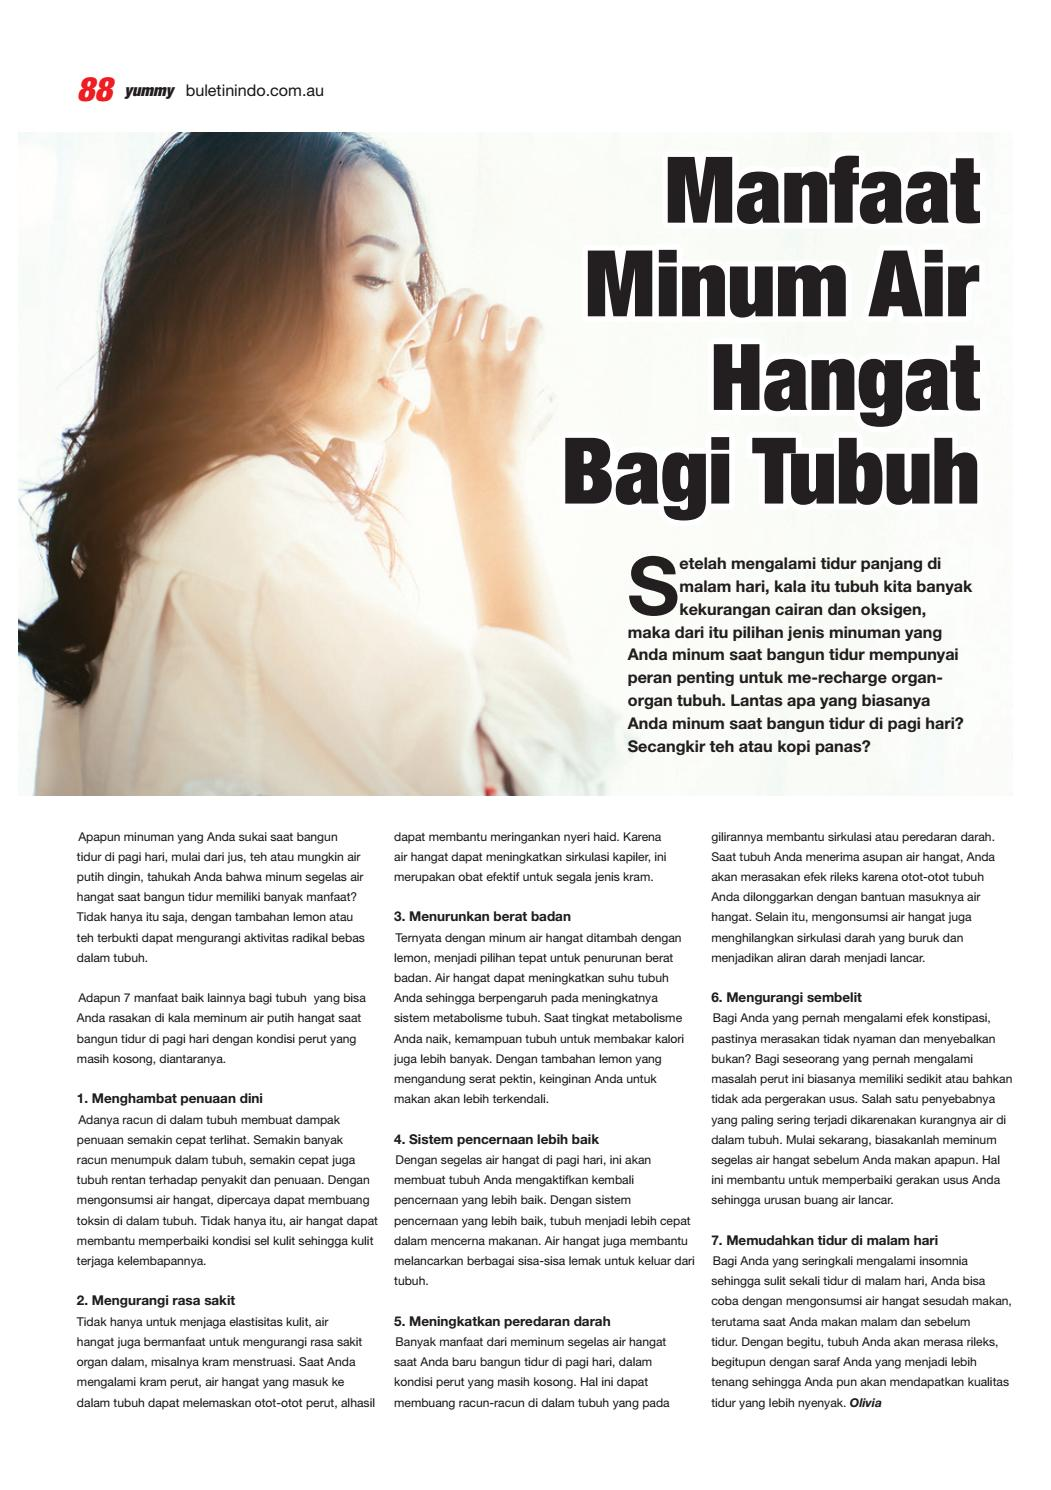 26 Manfaat Sering Minum Air Hangat Background Content